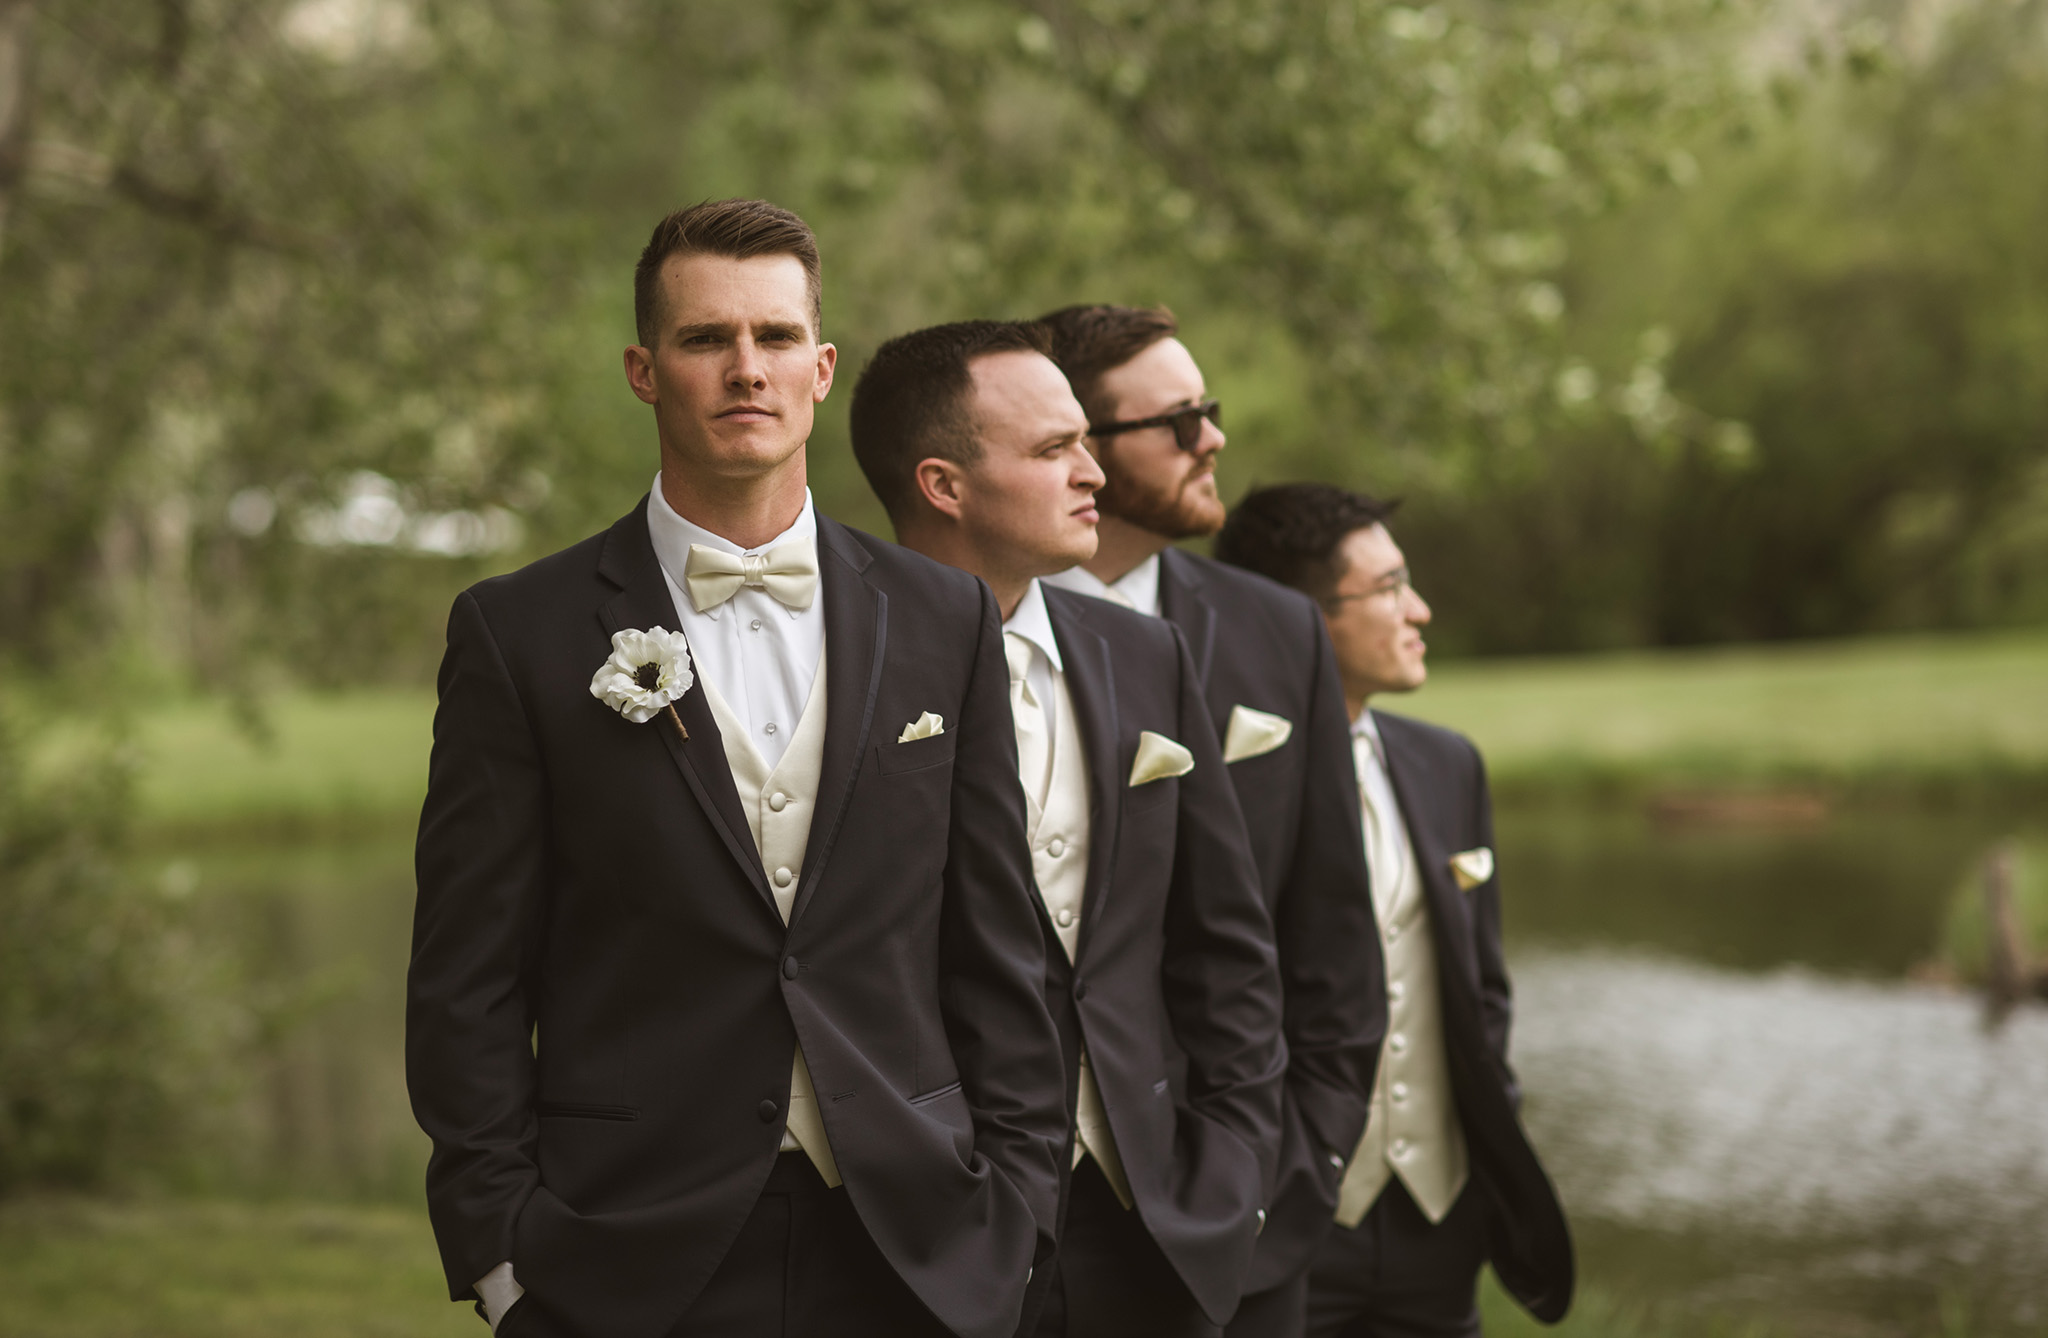 Estes-park-colorado-rocky-mountain-adventure-engagement-elopement-photographer-houston-texas-wedding